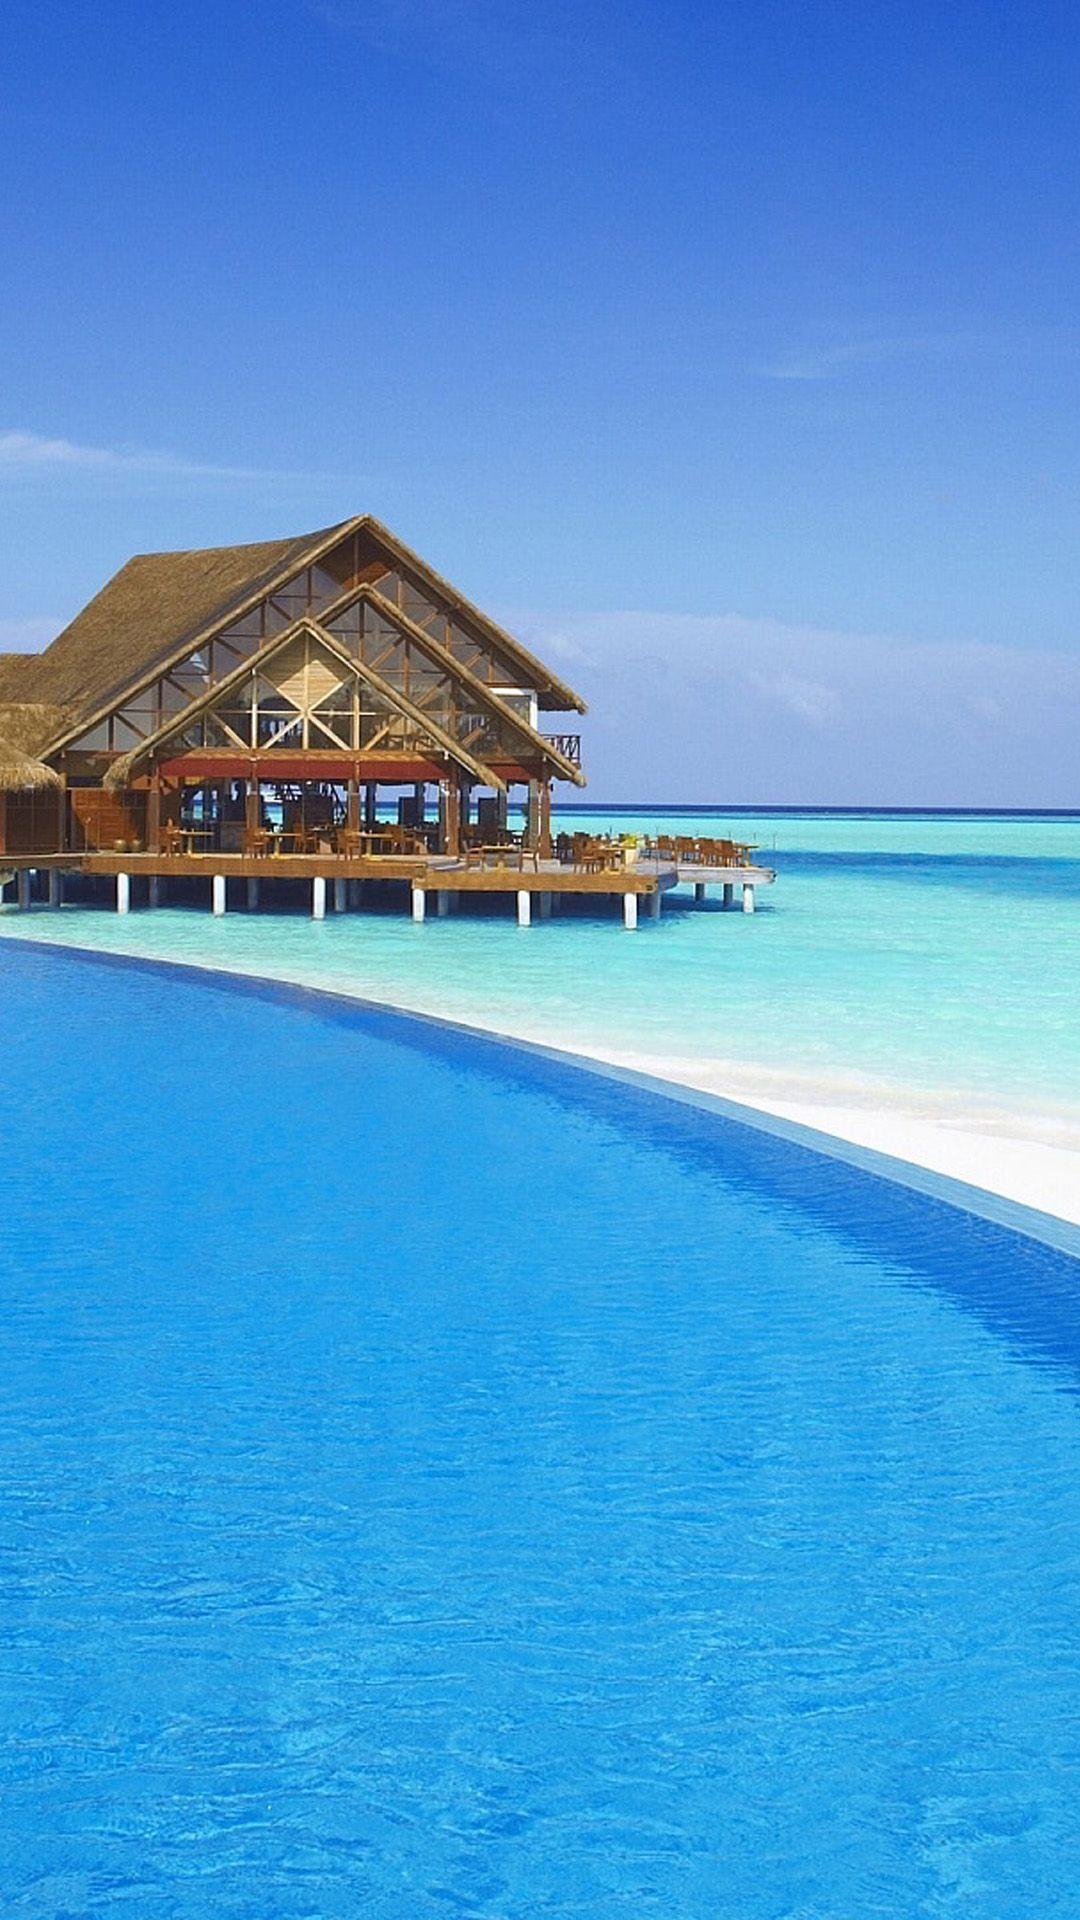 Aladdin beach resort, Hurghada, Egypt Vacation, Dream